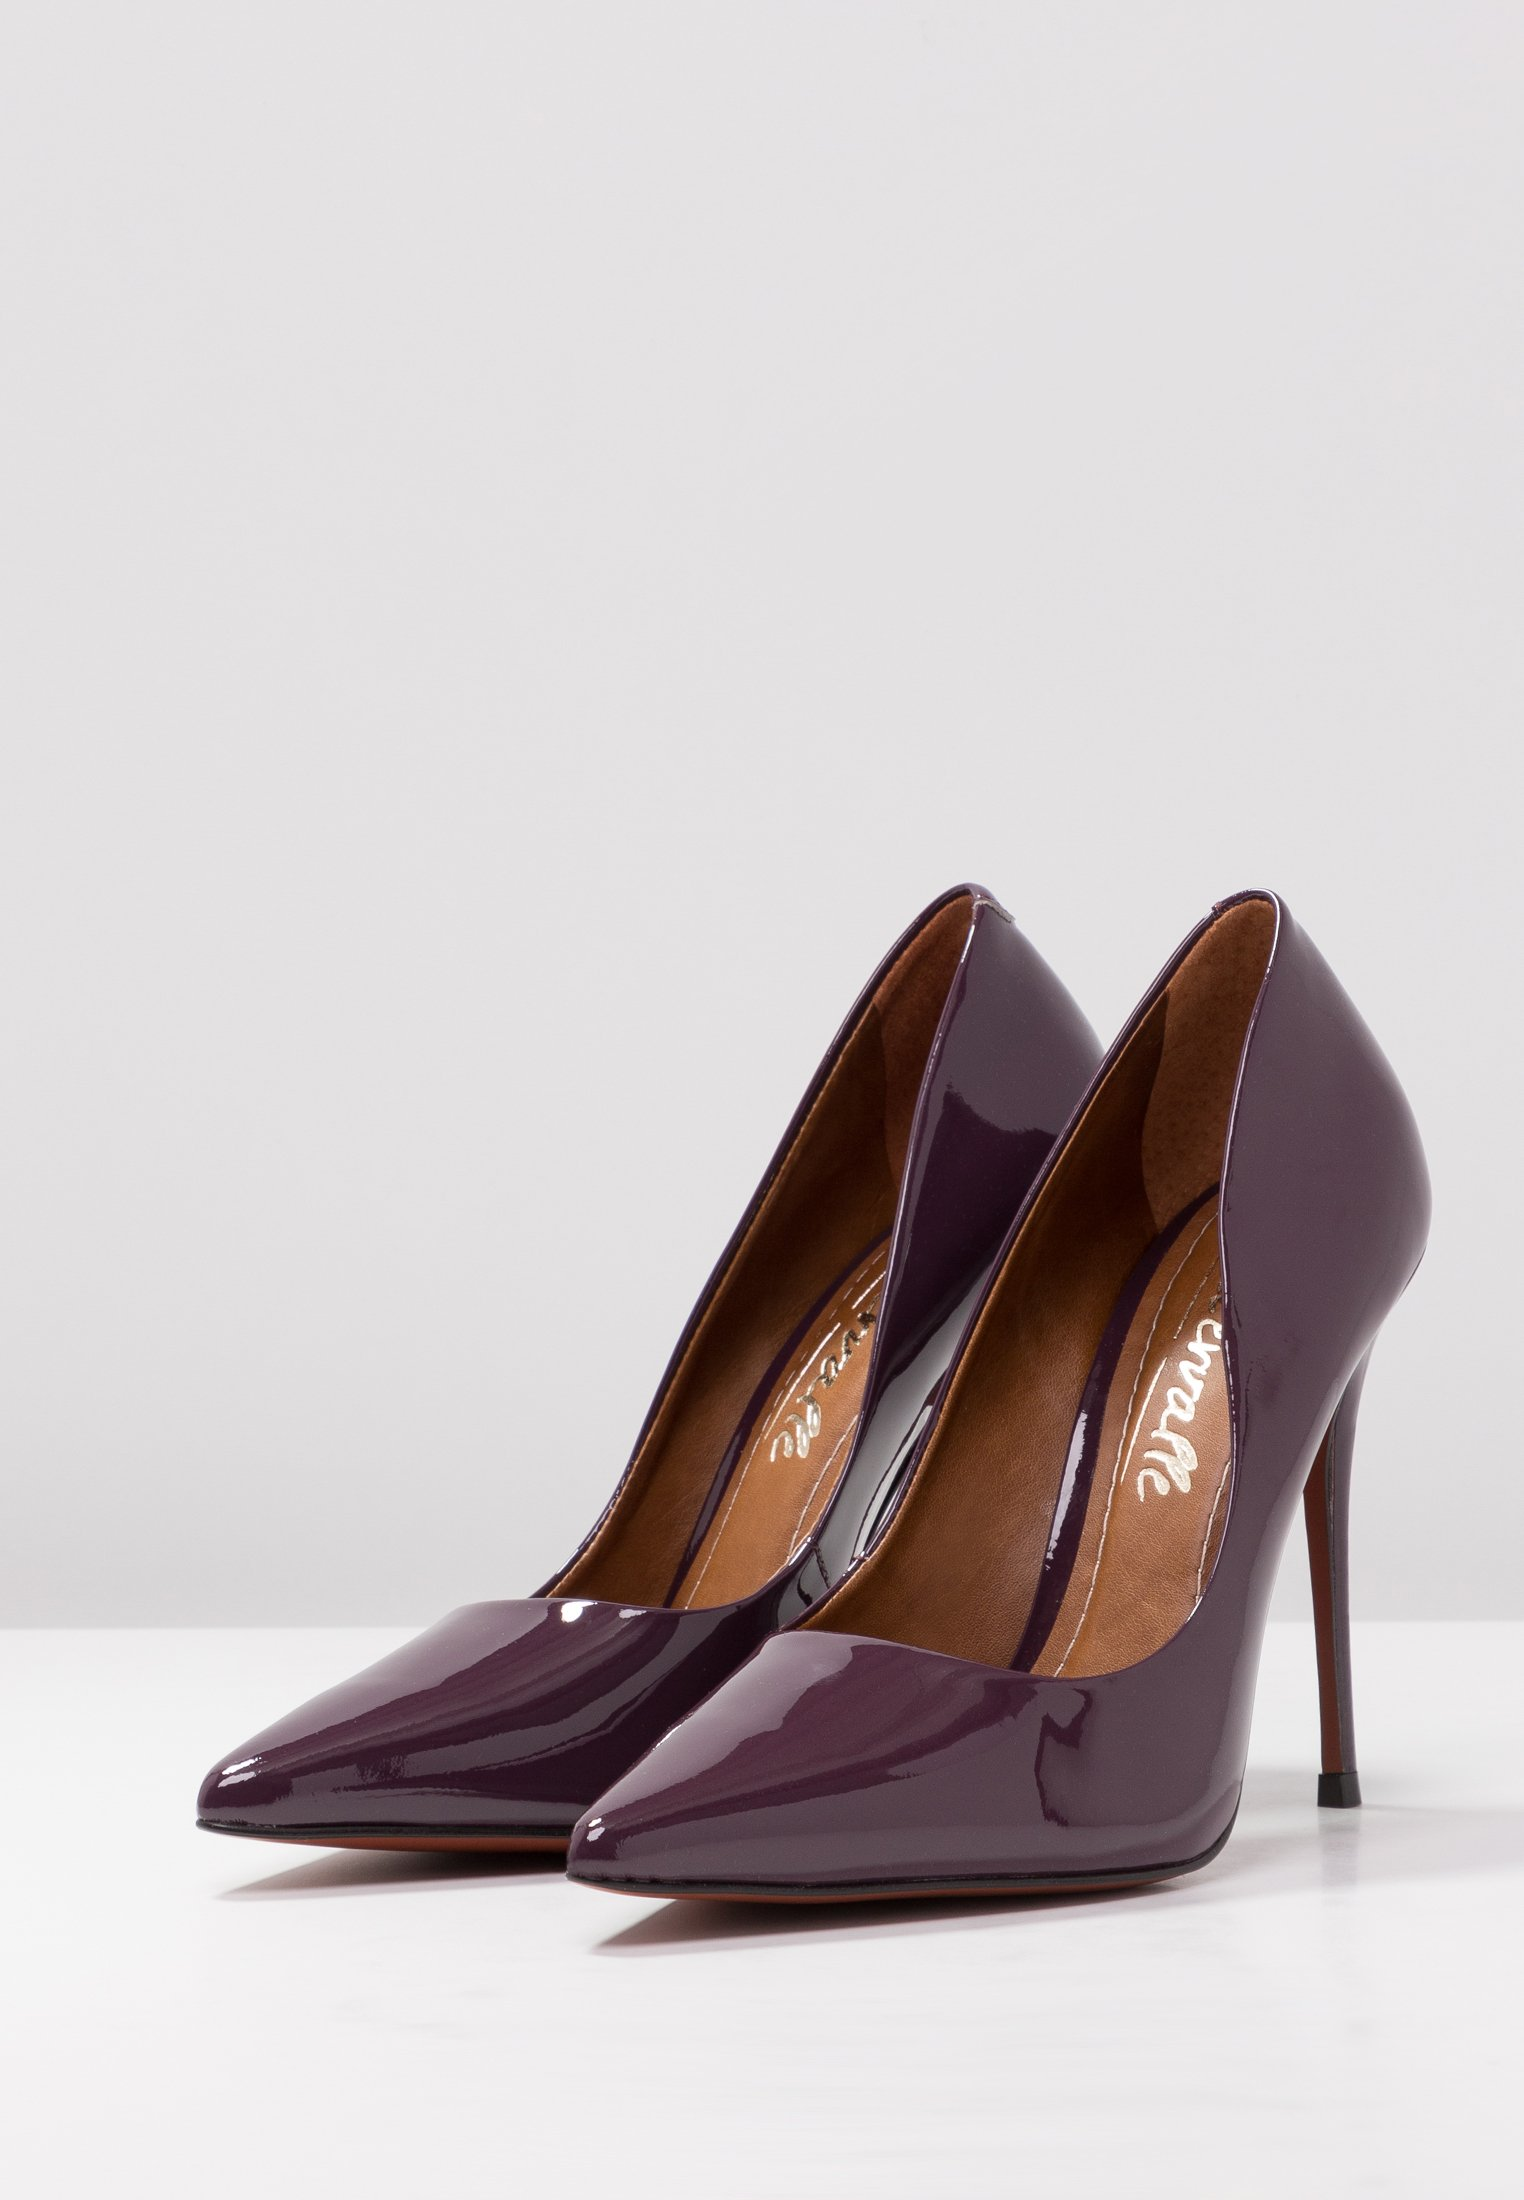 L'INTERVALLE TEEVA - Escarpins à talons hauts purple